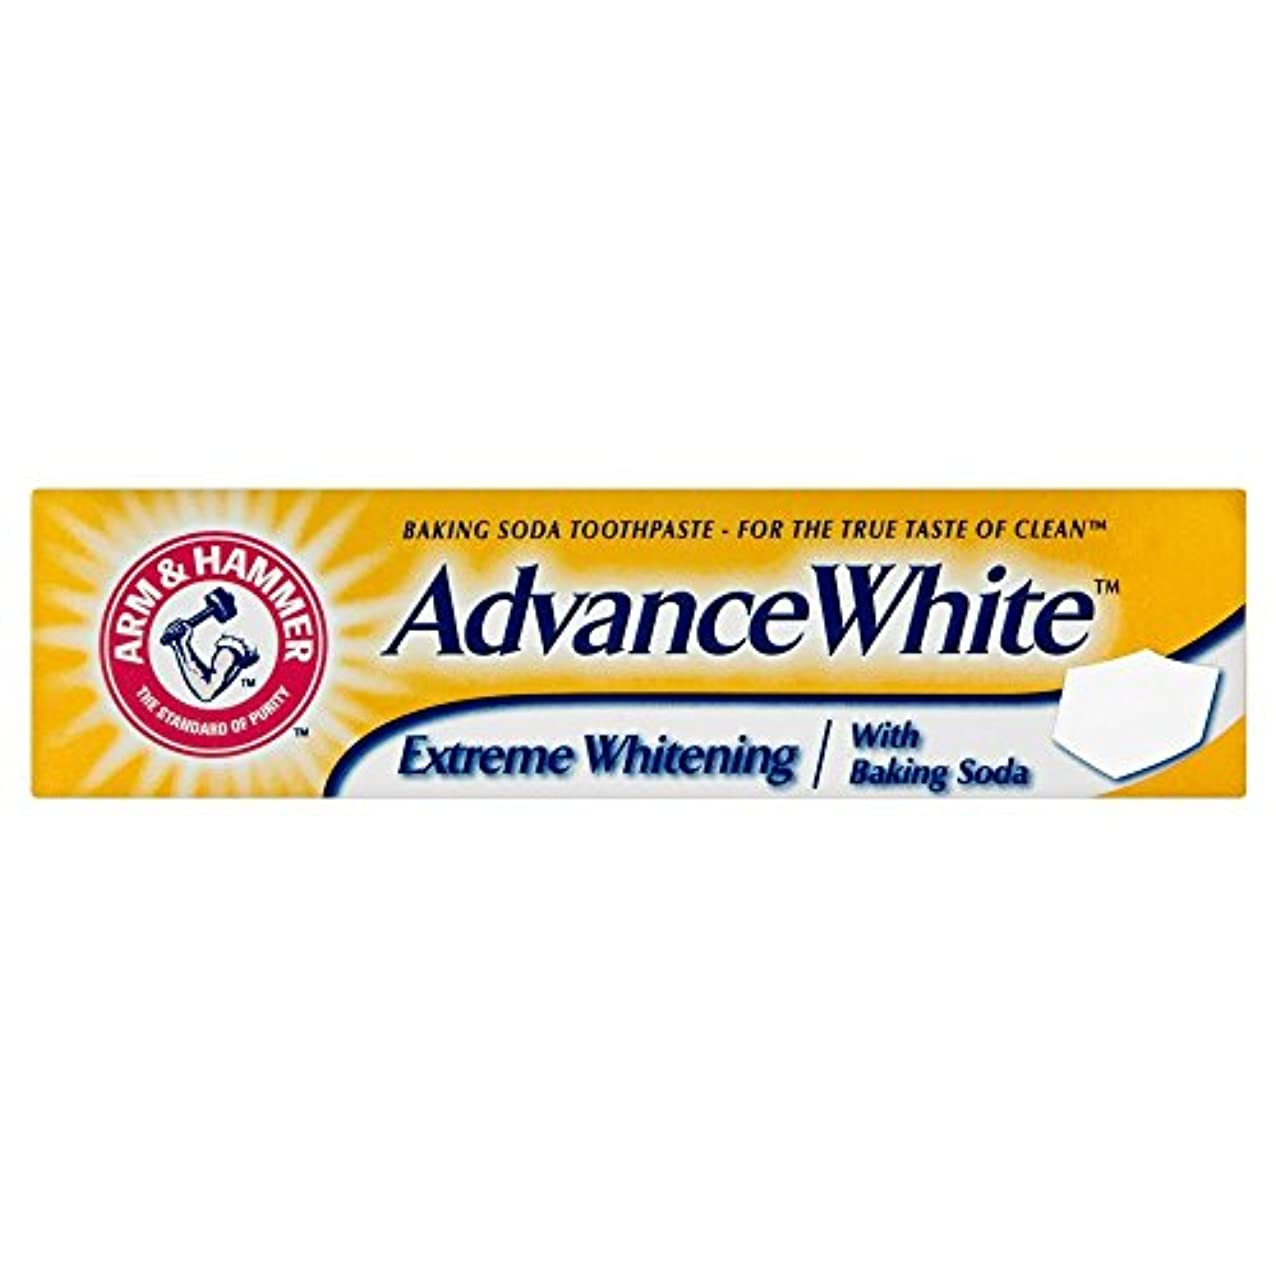 Arm & Hammer Advanced Whitening Toothpaste Tube (75ml) アームとハンマーは美白高度な歯磨き粉のチューブ( 75ミリリットル) [並行輸入品]